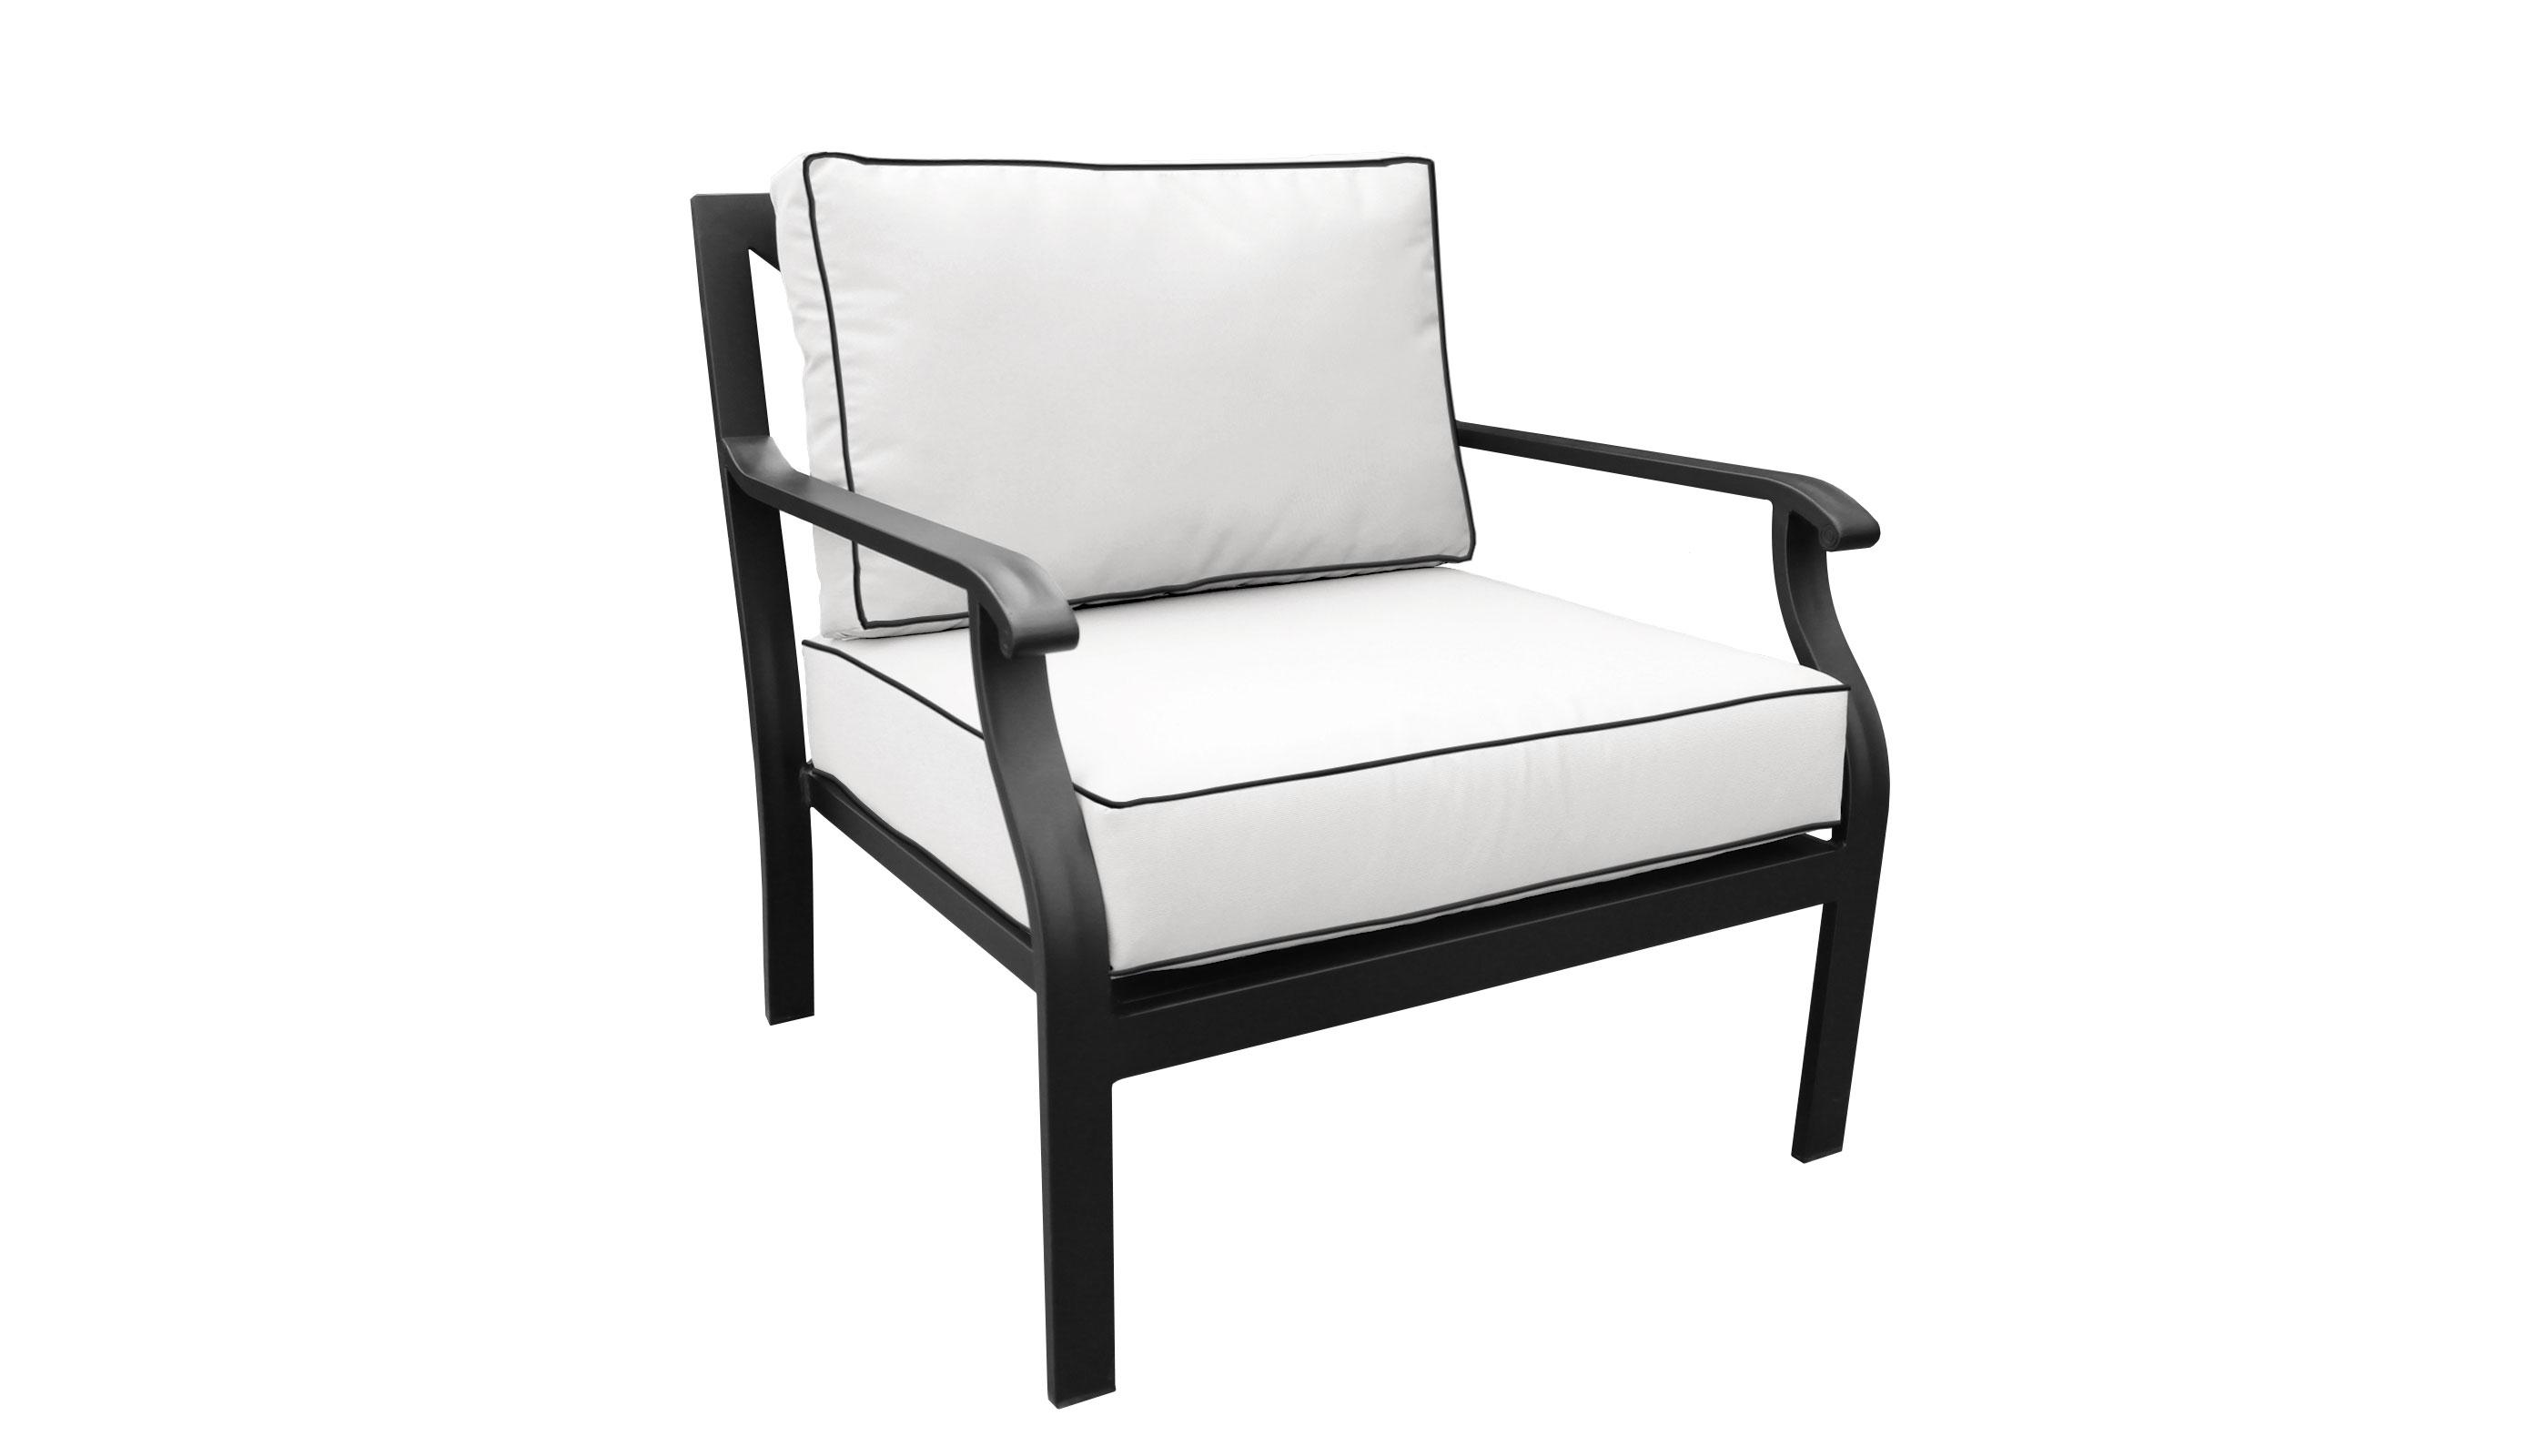 kathy ireland Homes & Gardens Madison Ave. 2 Piece Outdoor Aluminum Patio Furniture Set 02b - TK Classics